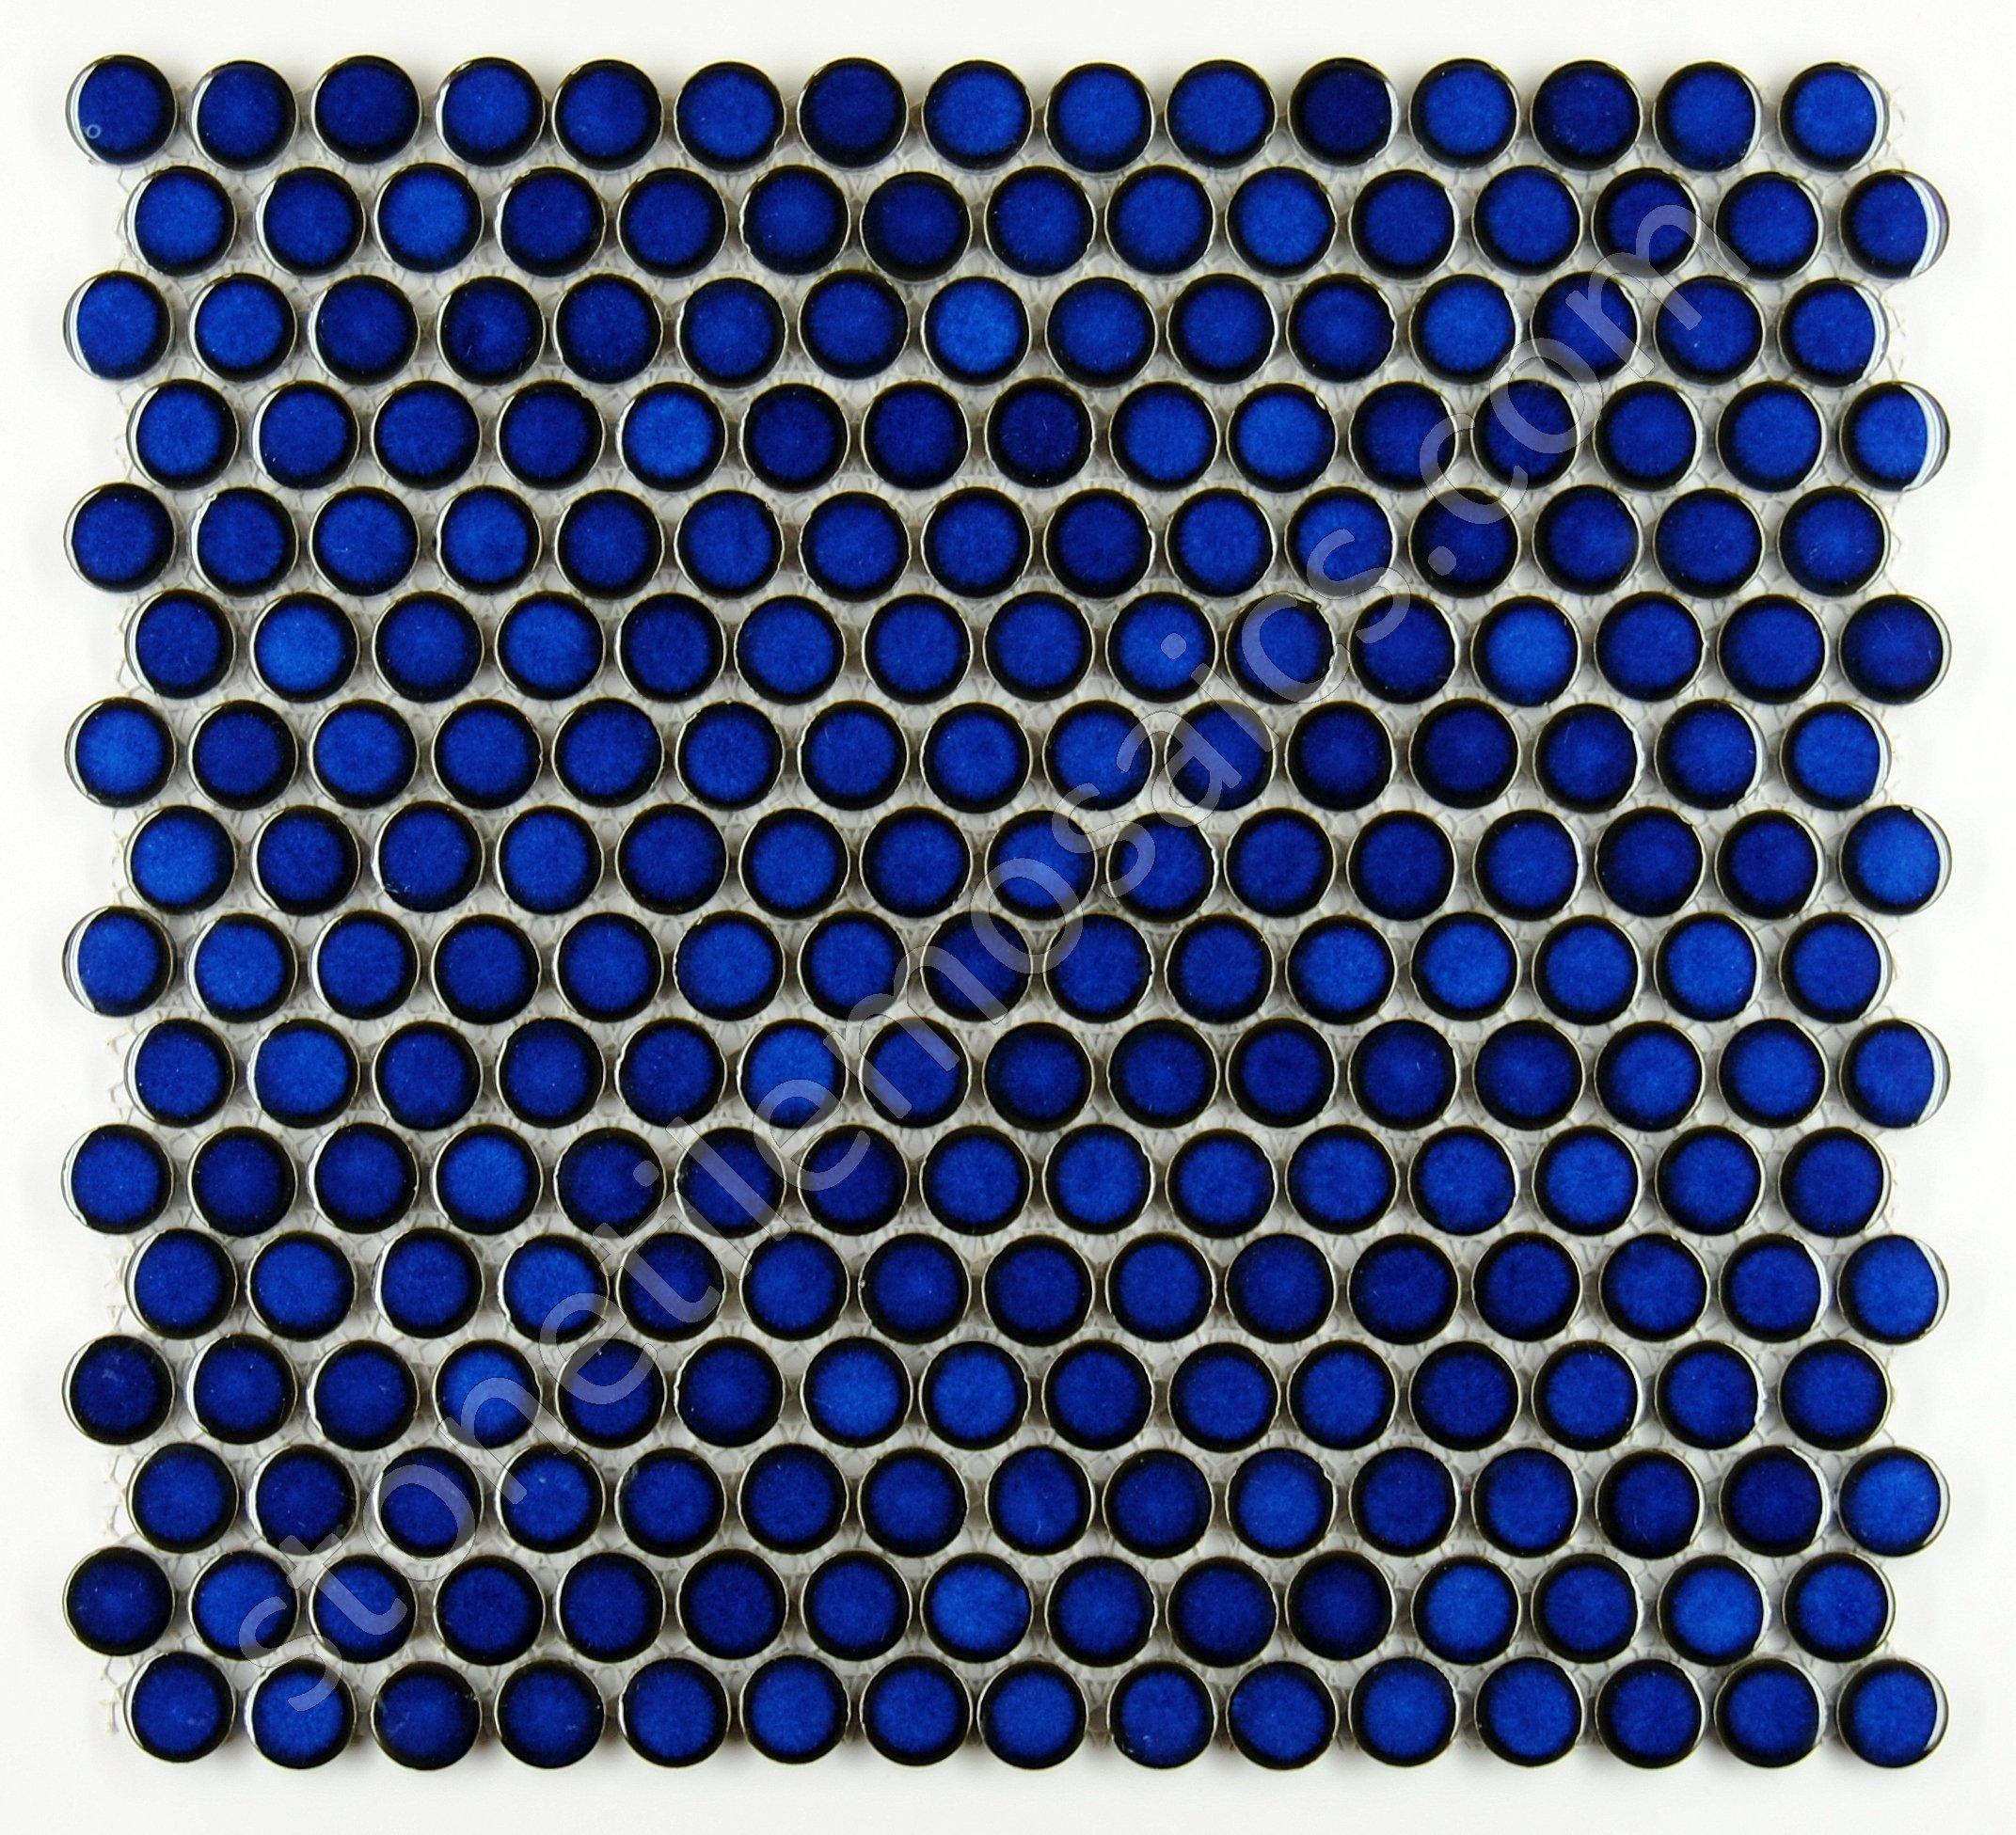 Penny Round Tile Cobalt Blue Porcelain Mosaic Shiny Look (Box of 5.1 Sq Ft)